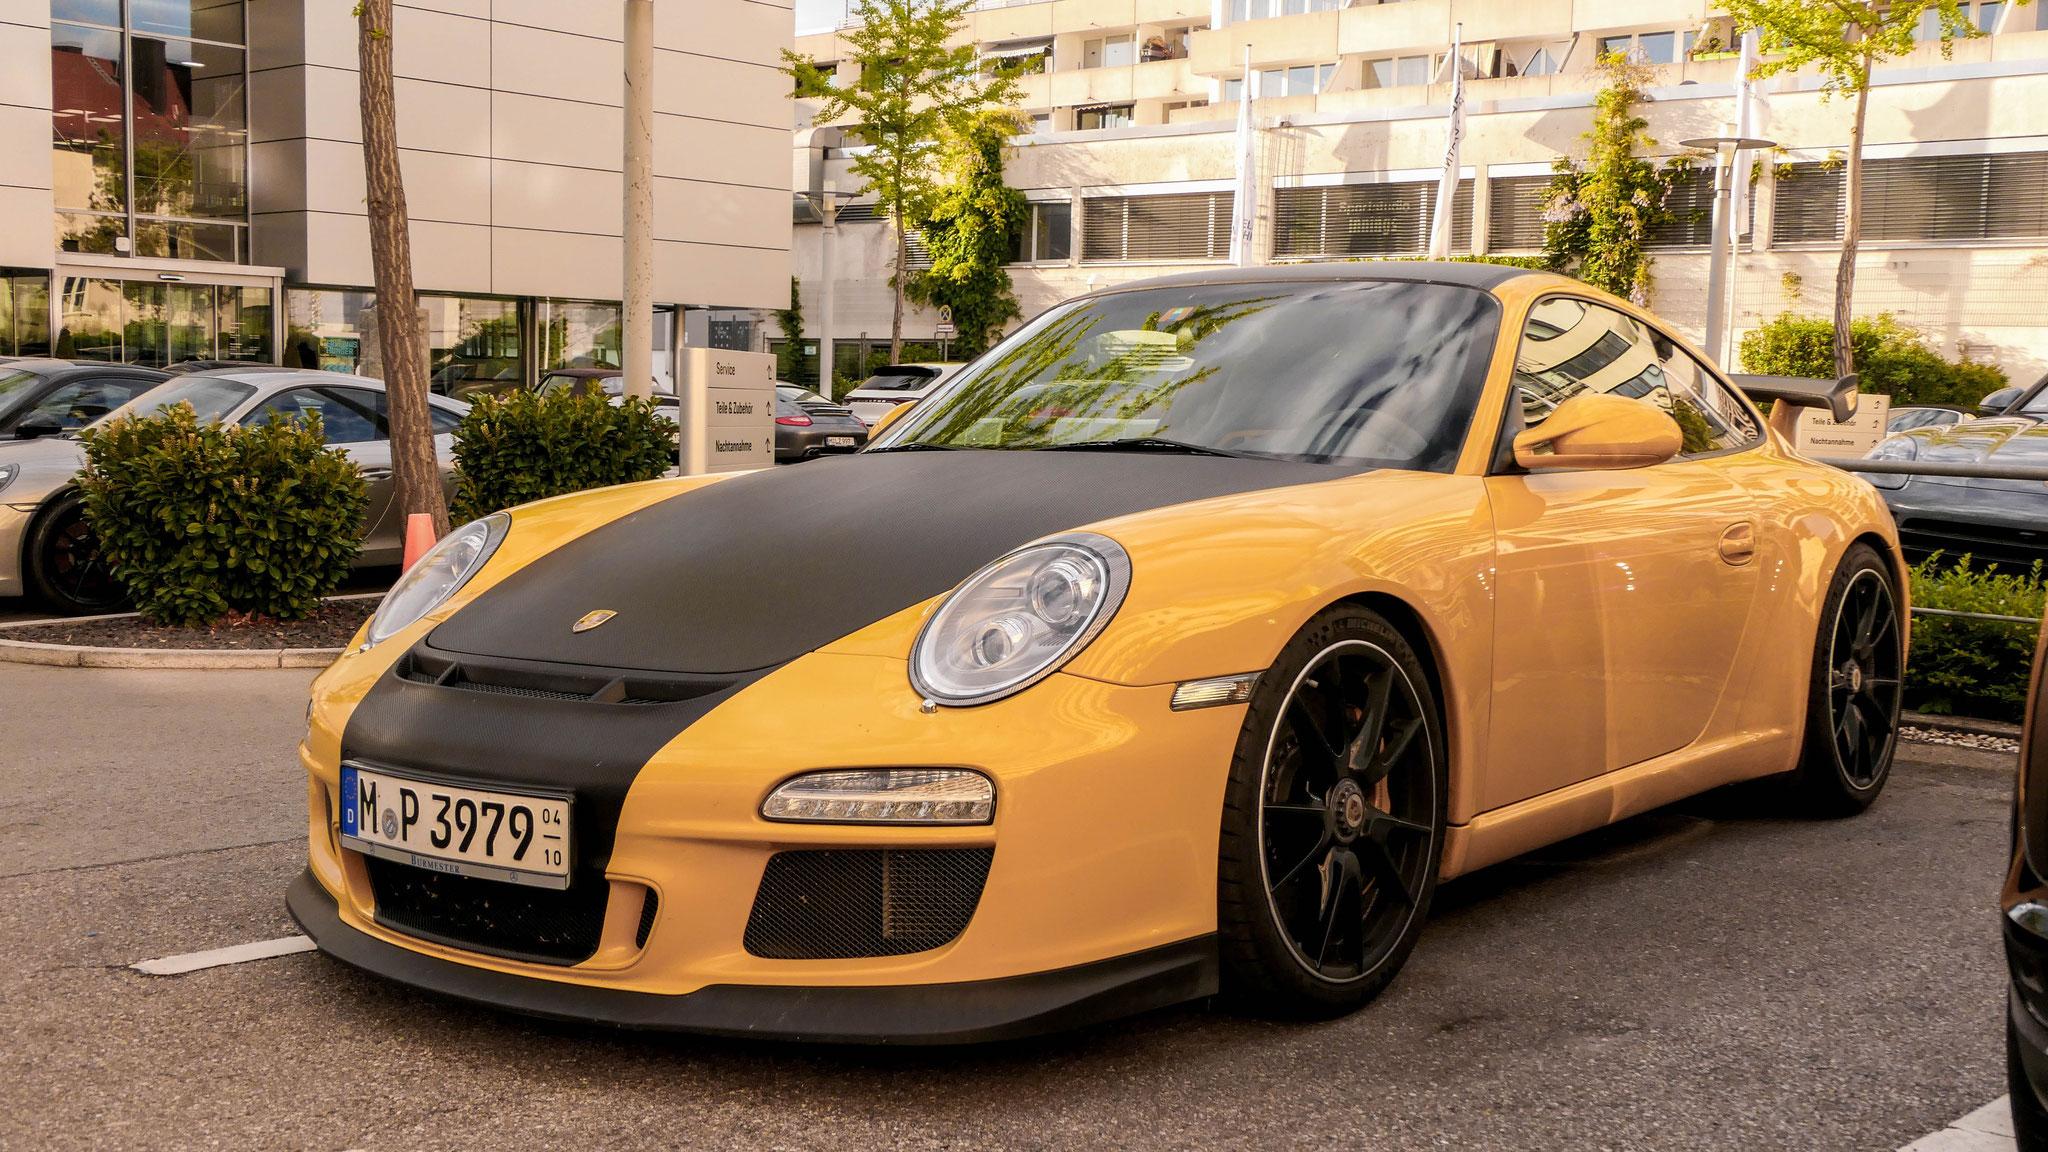 Porsche GT3 997 - M-P-3979